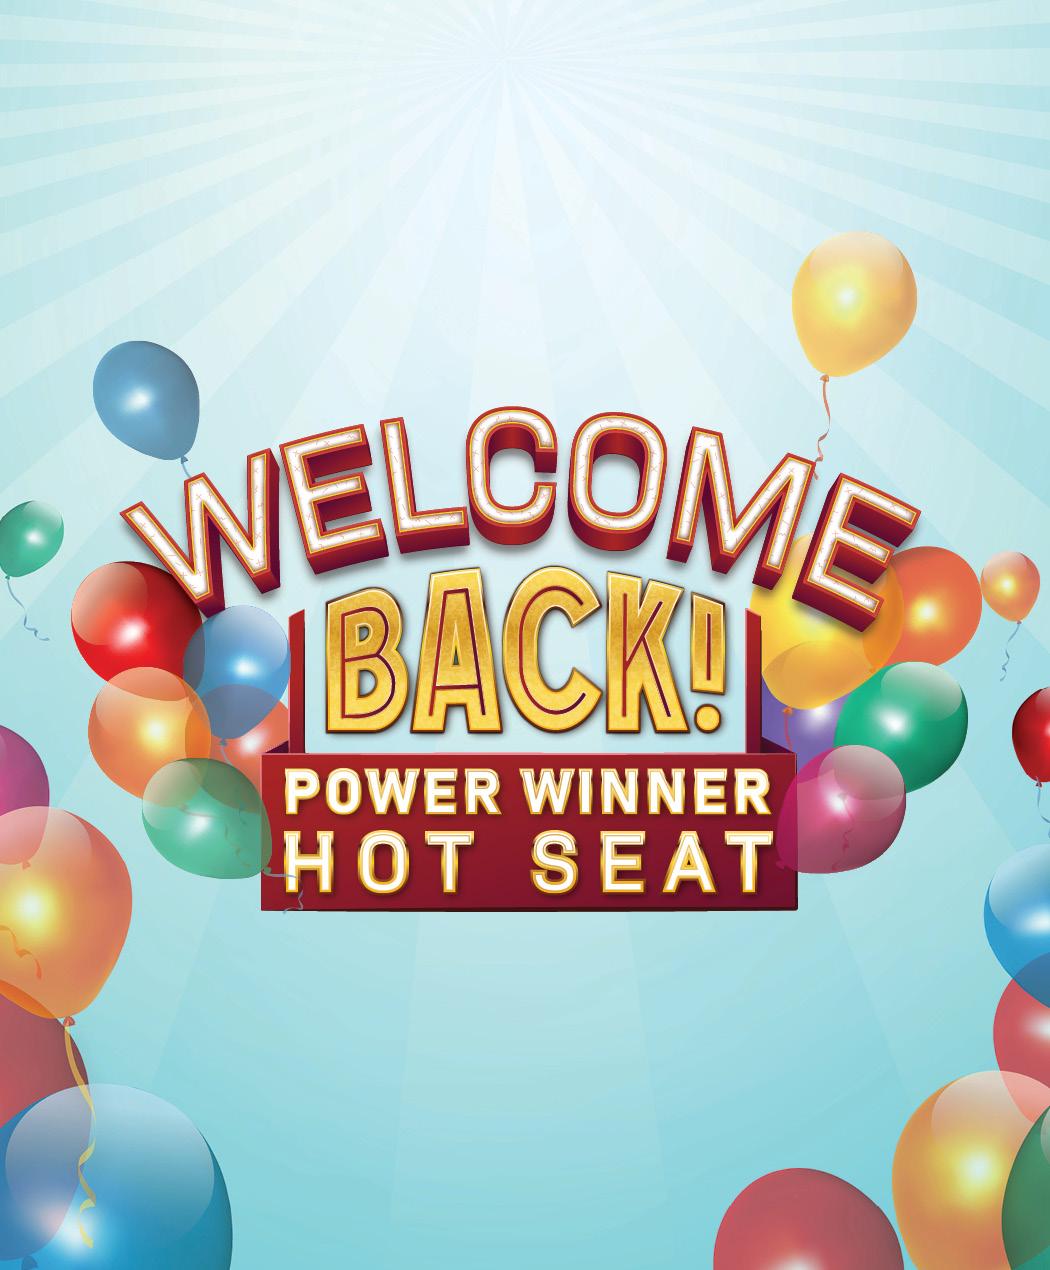 Welcome Back Power Winner Hot Seat